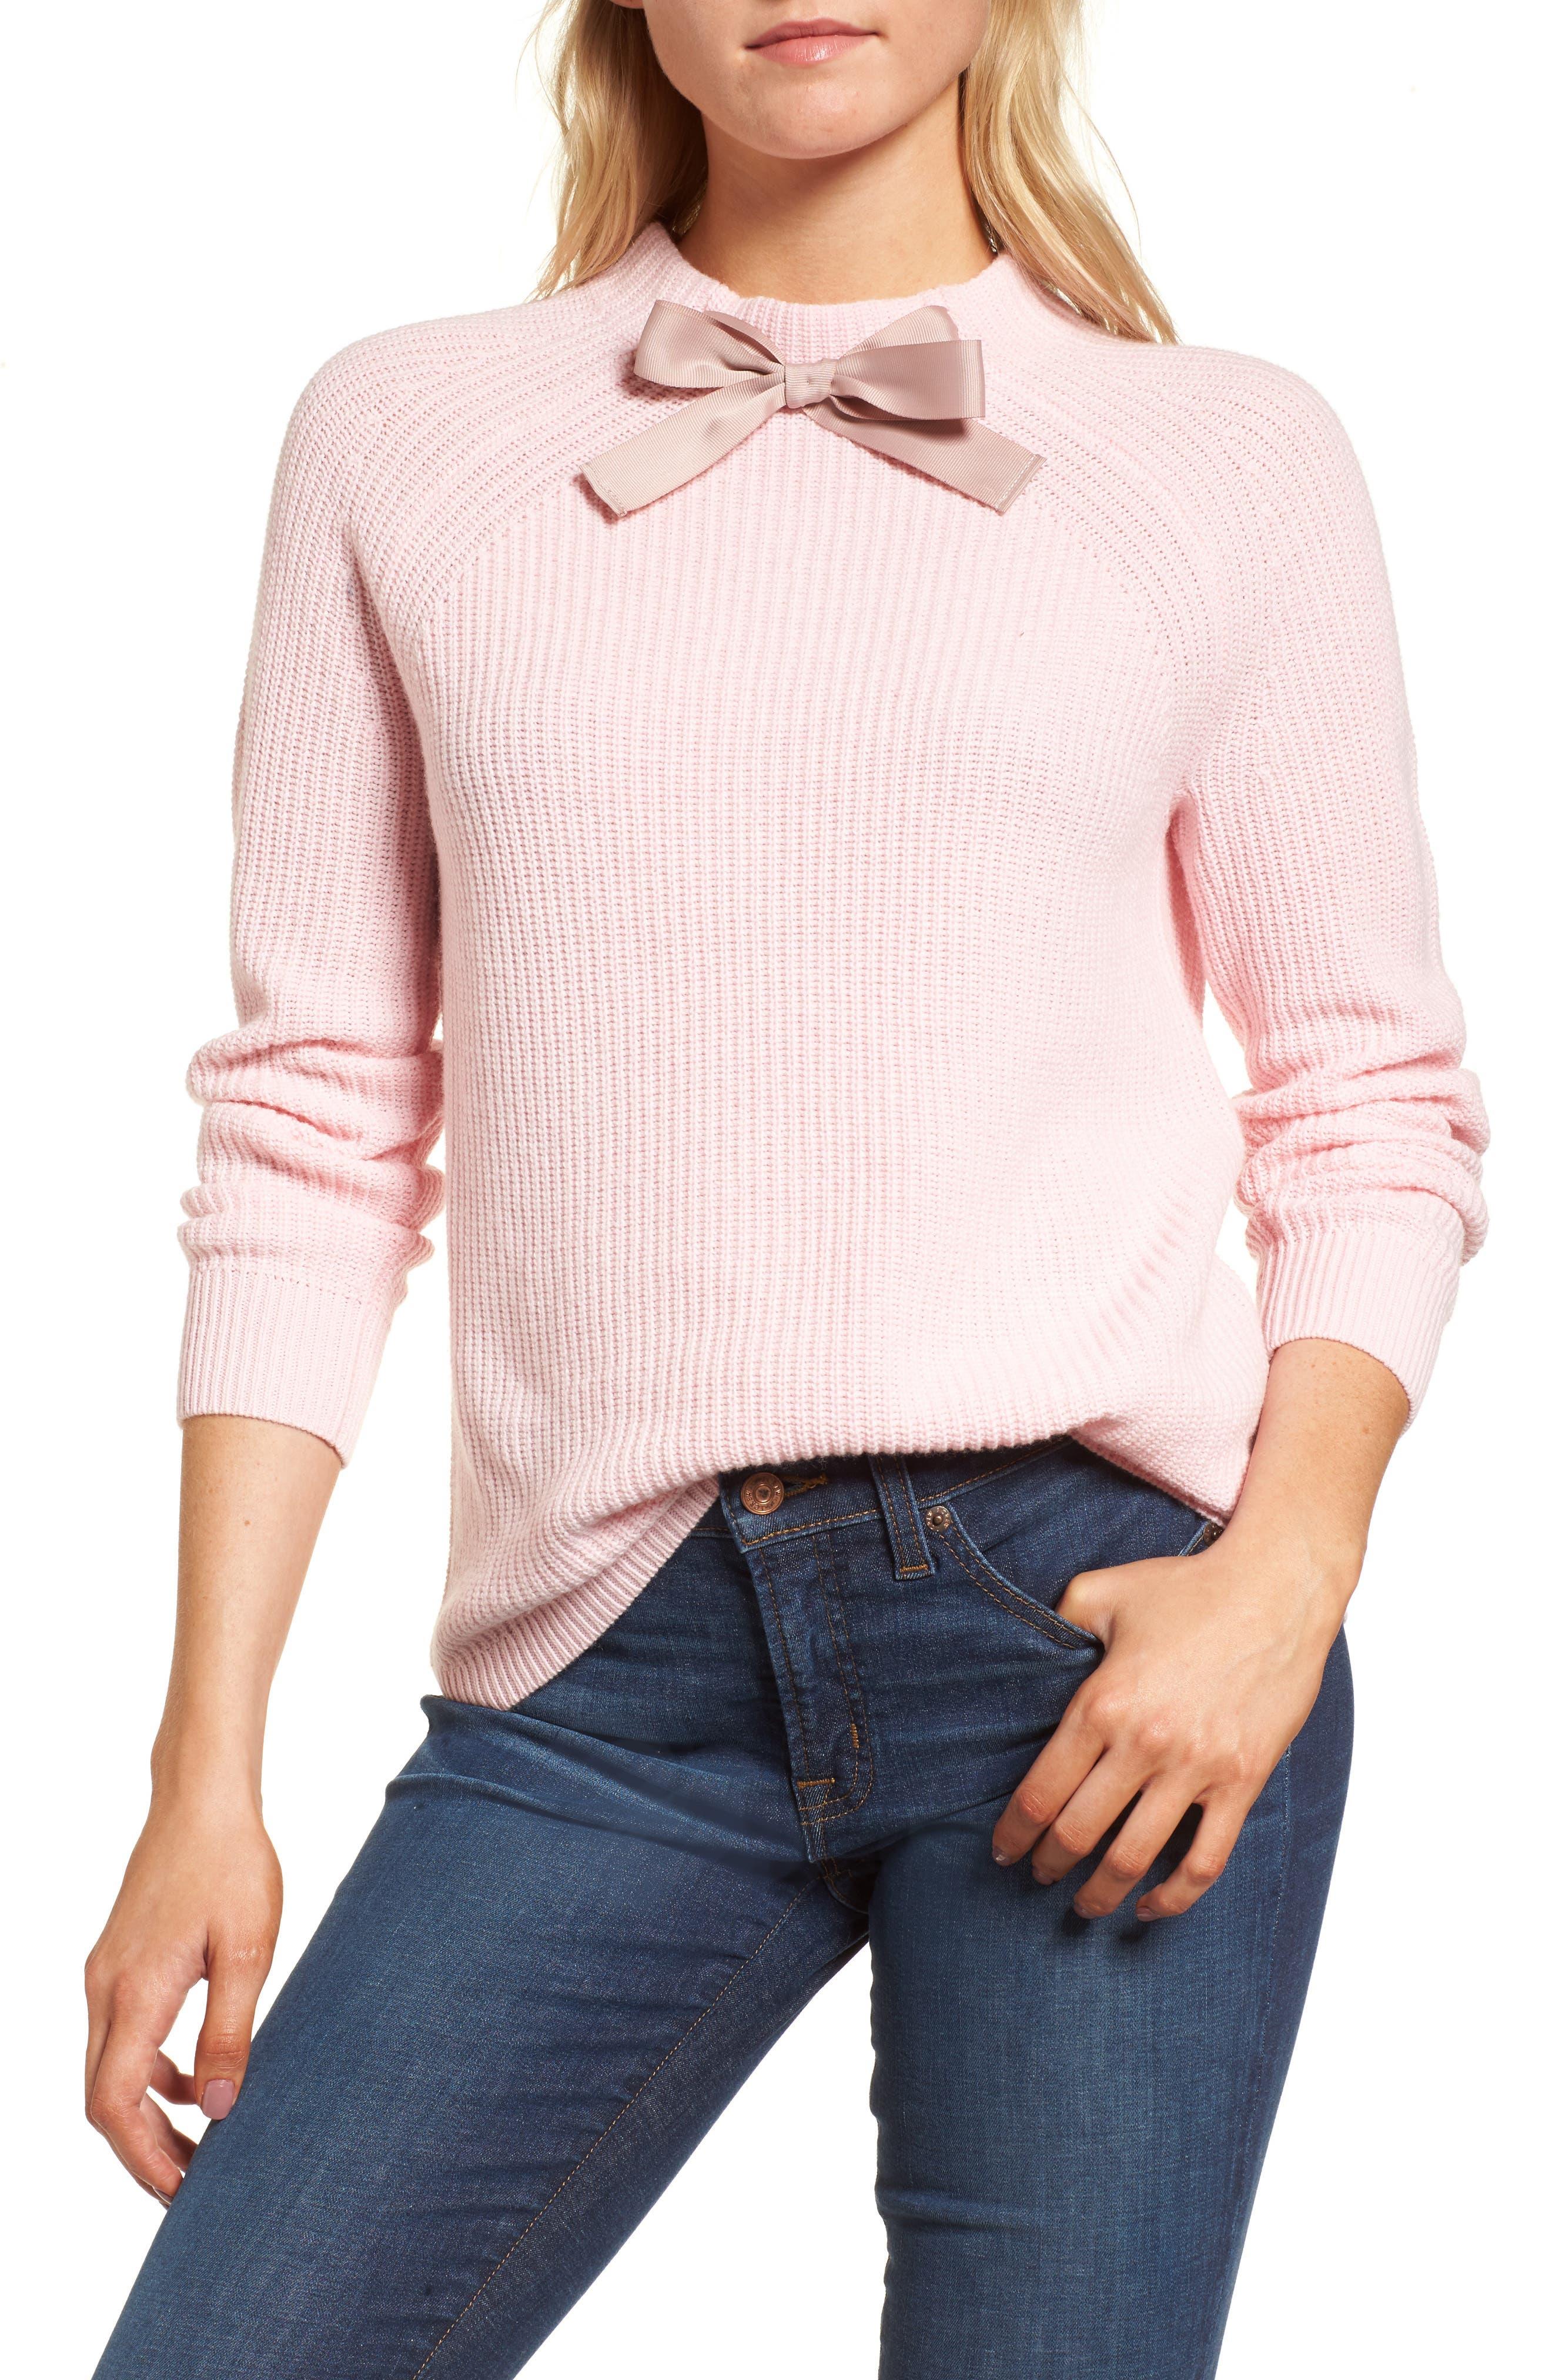 J.Crew Gayle Tie Neck Sweater